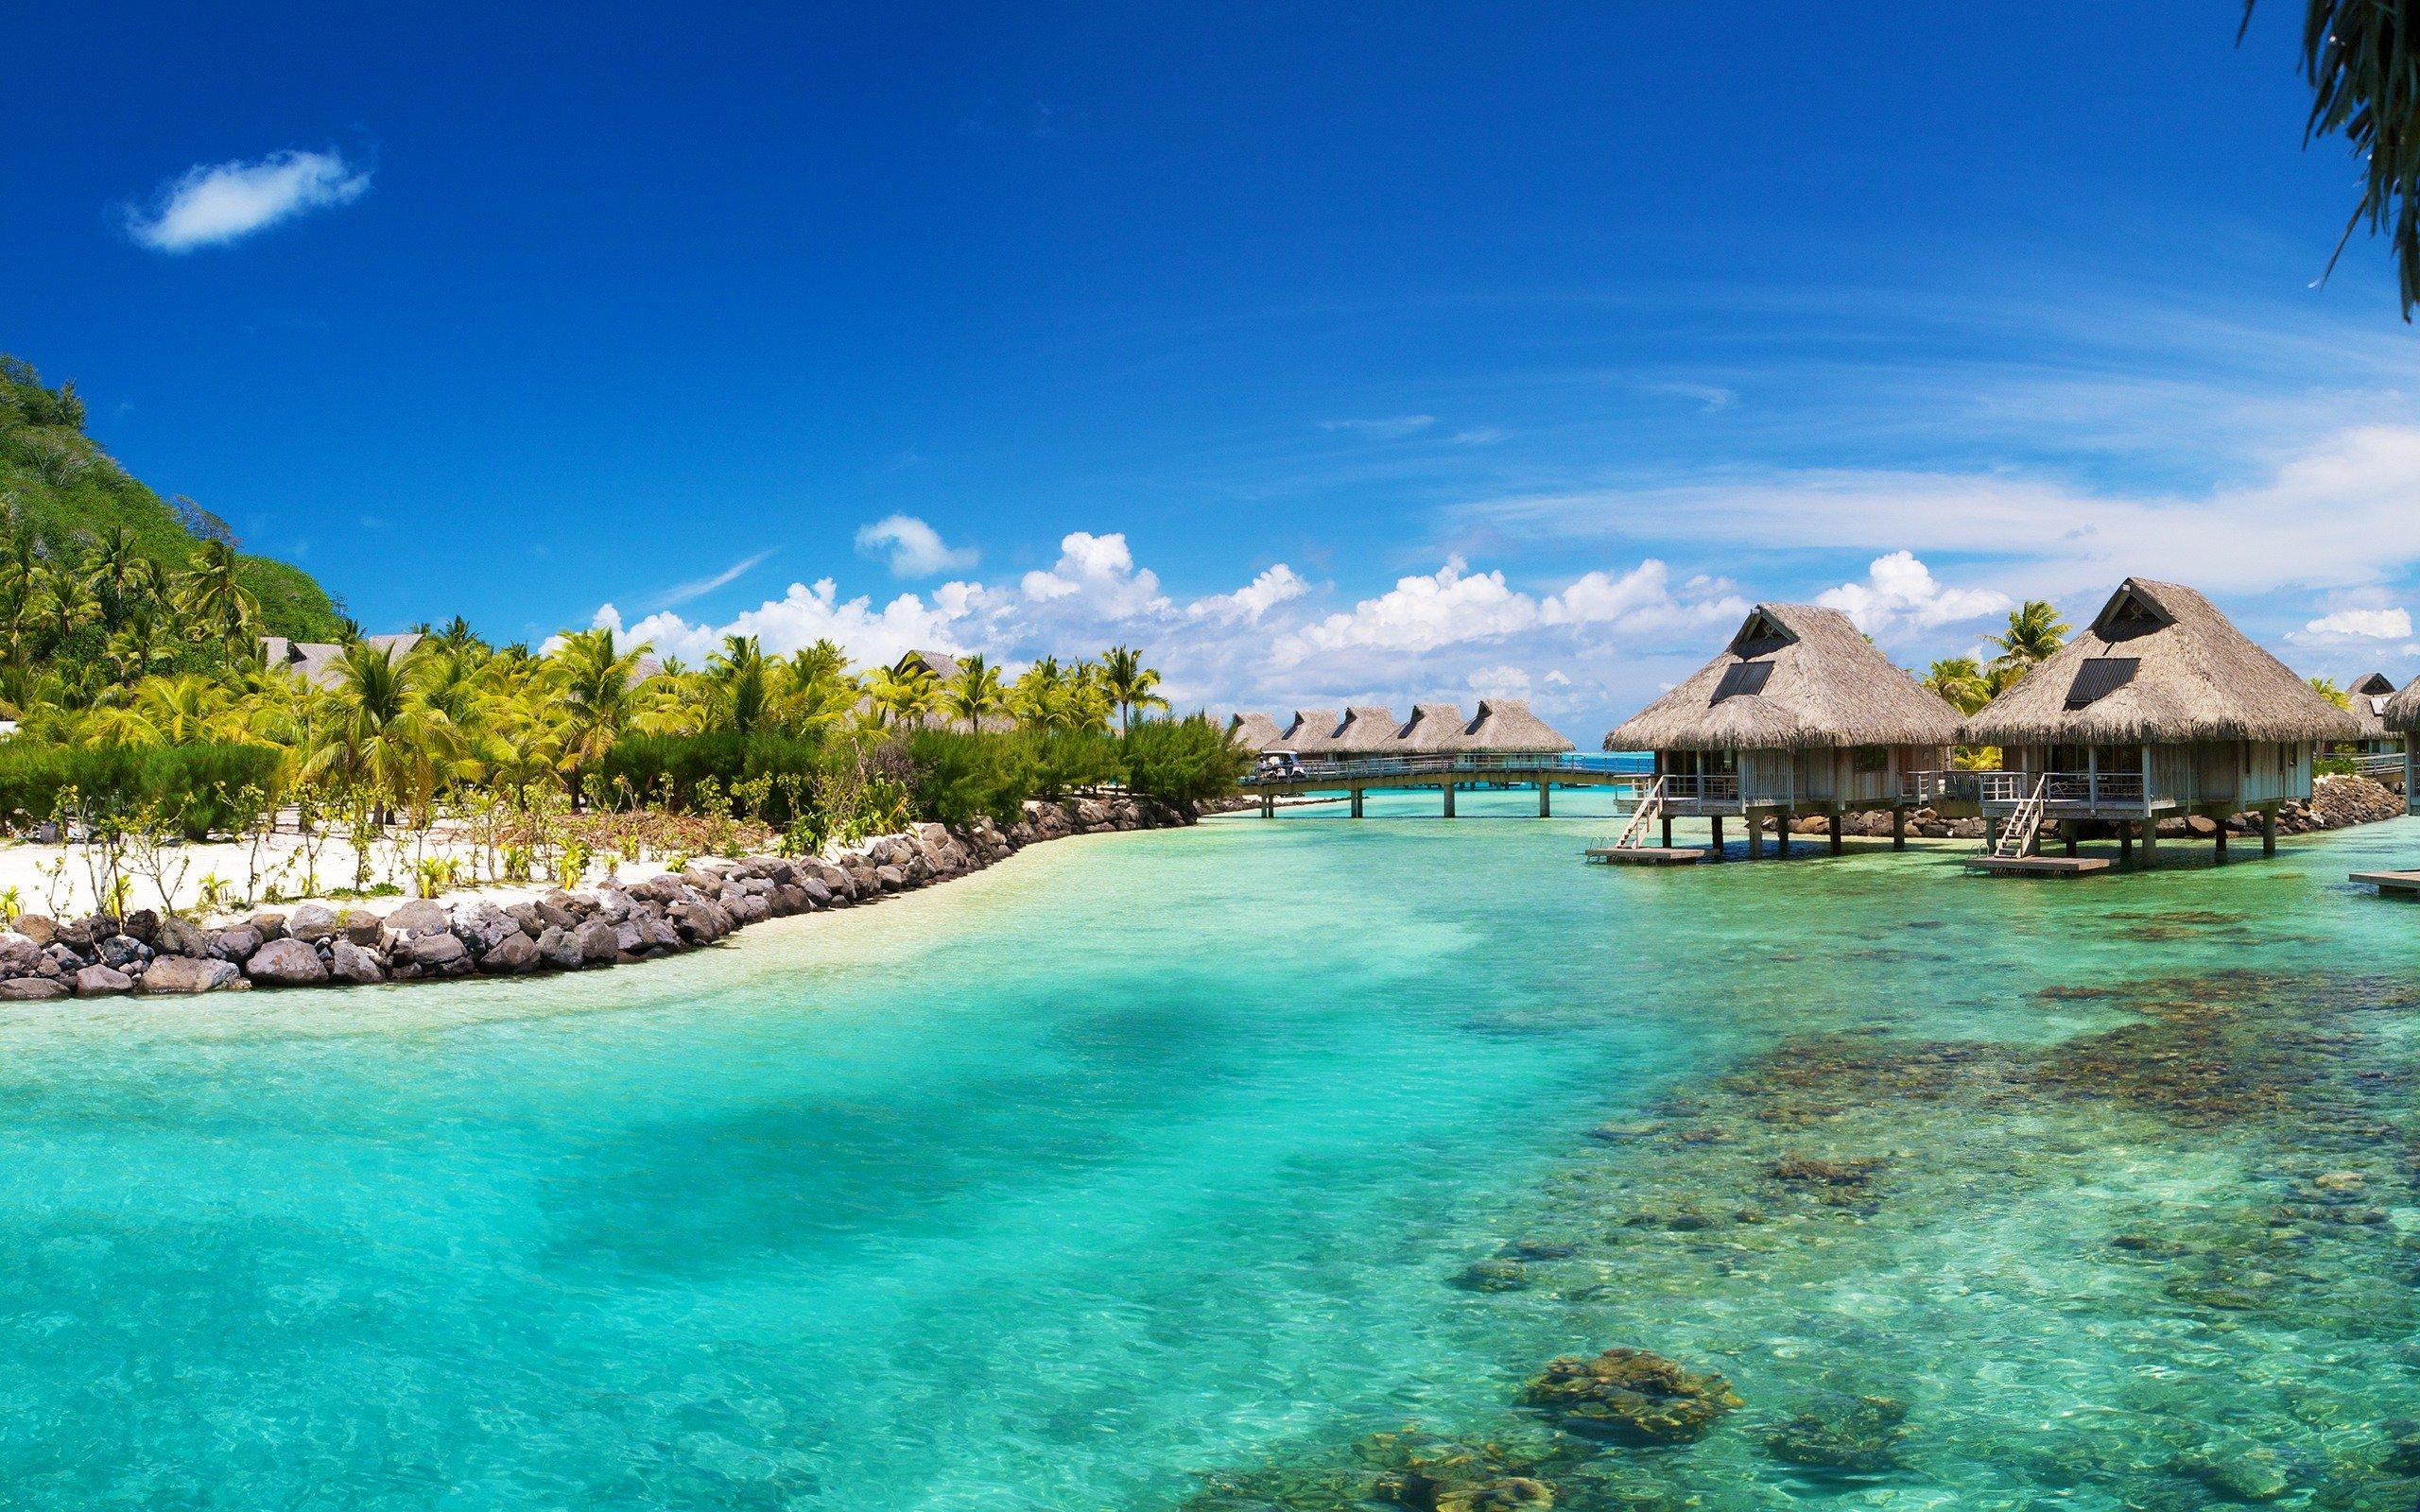 Hilton Bora Bora Wallpapers 2560x1600